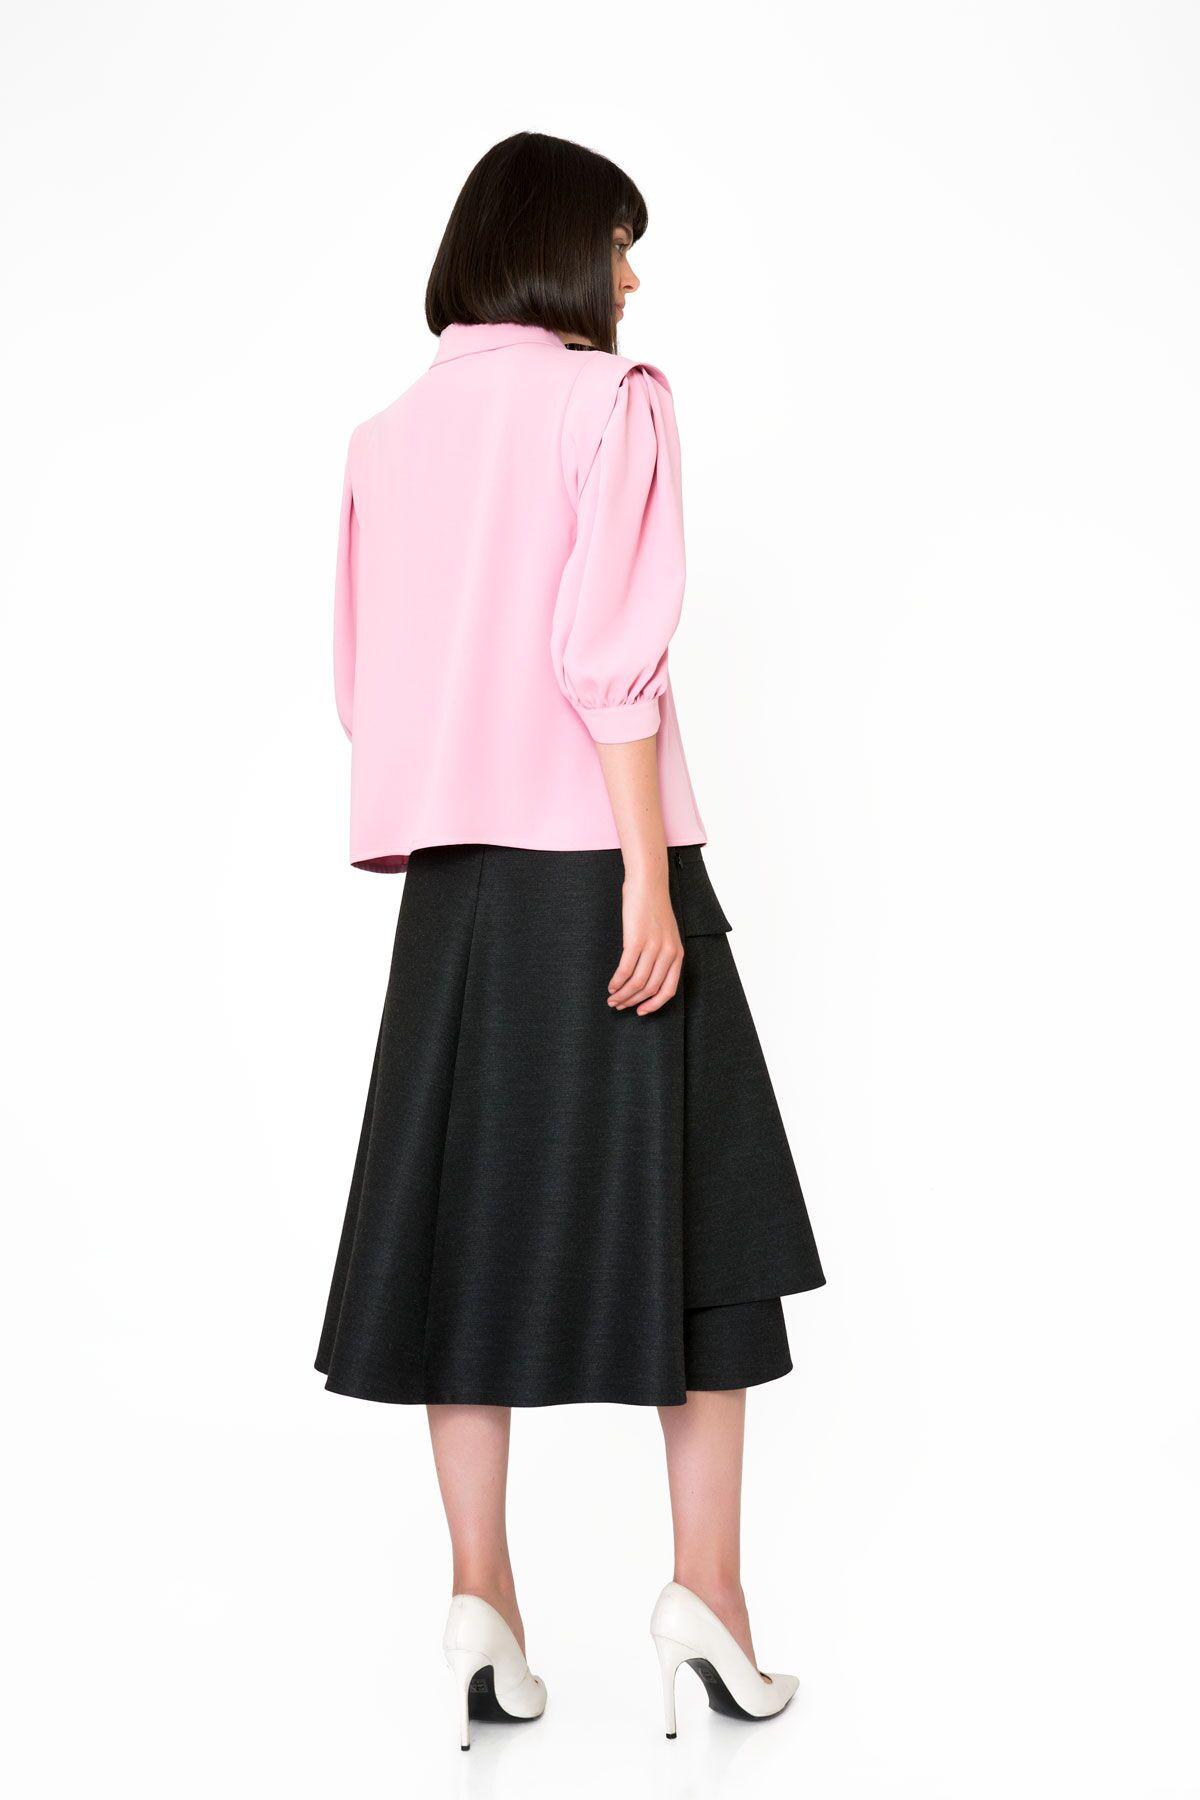 Collar Applique Detailed Pink Shirt